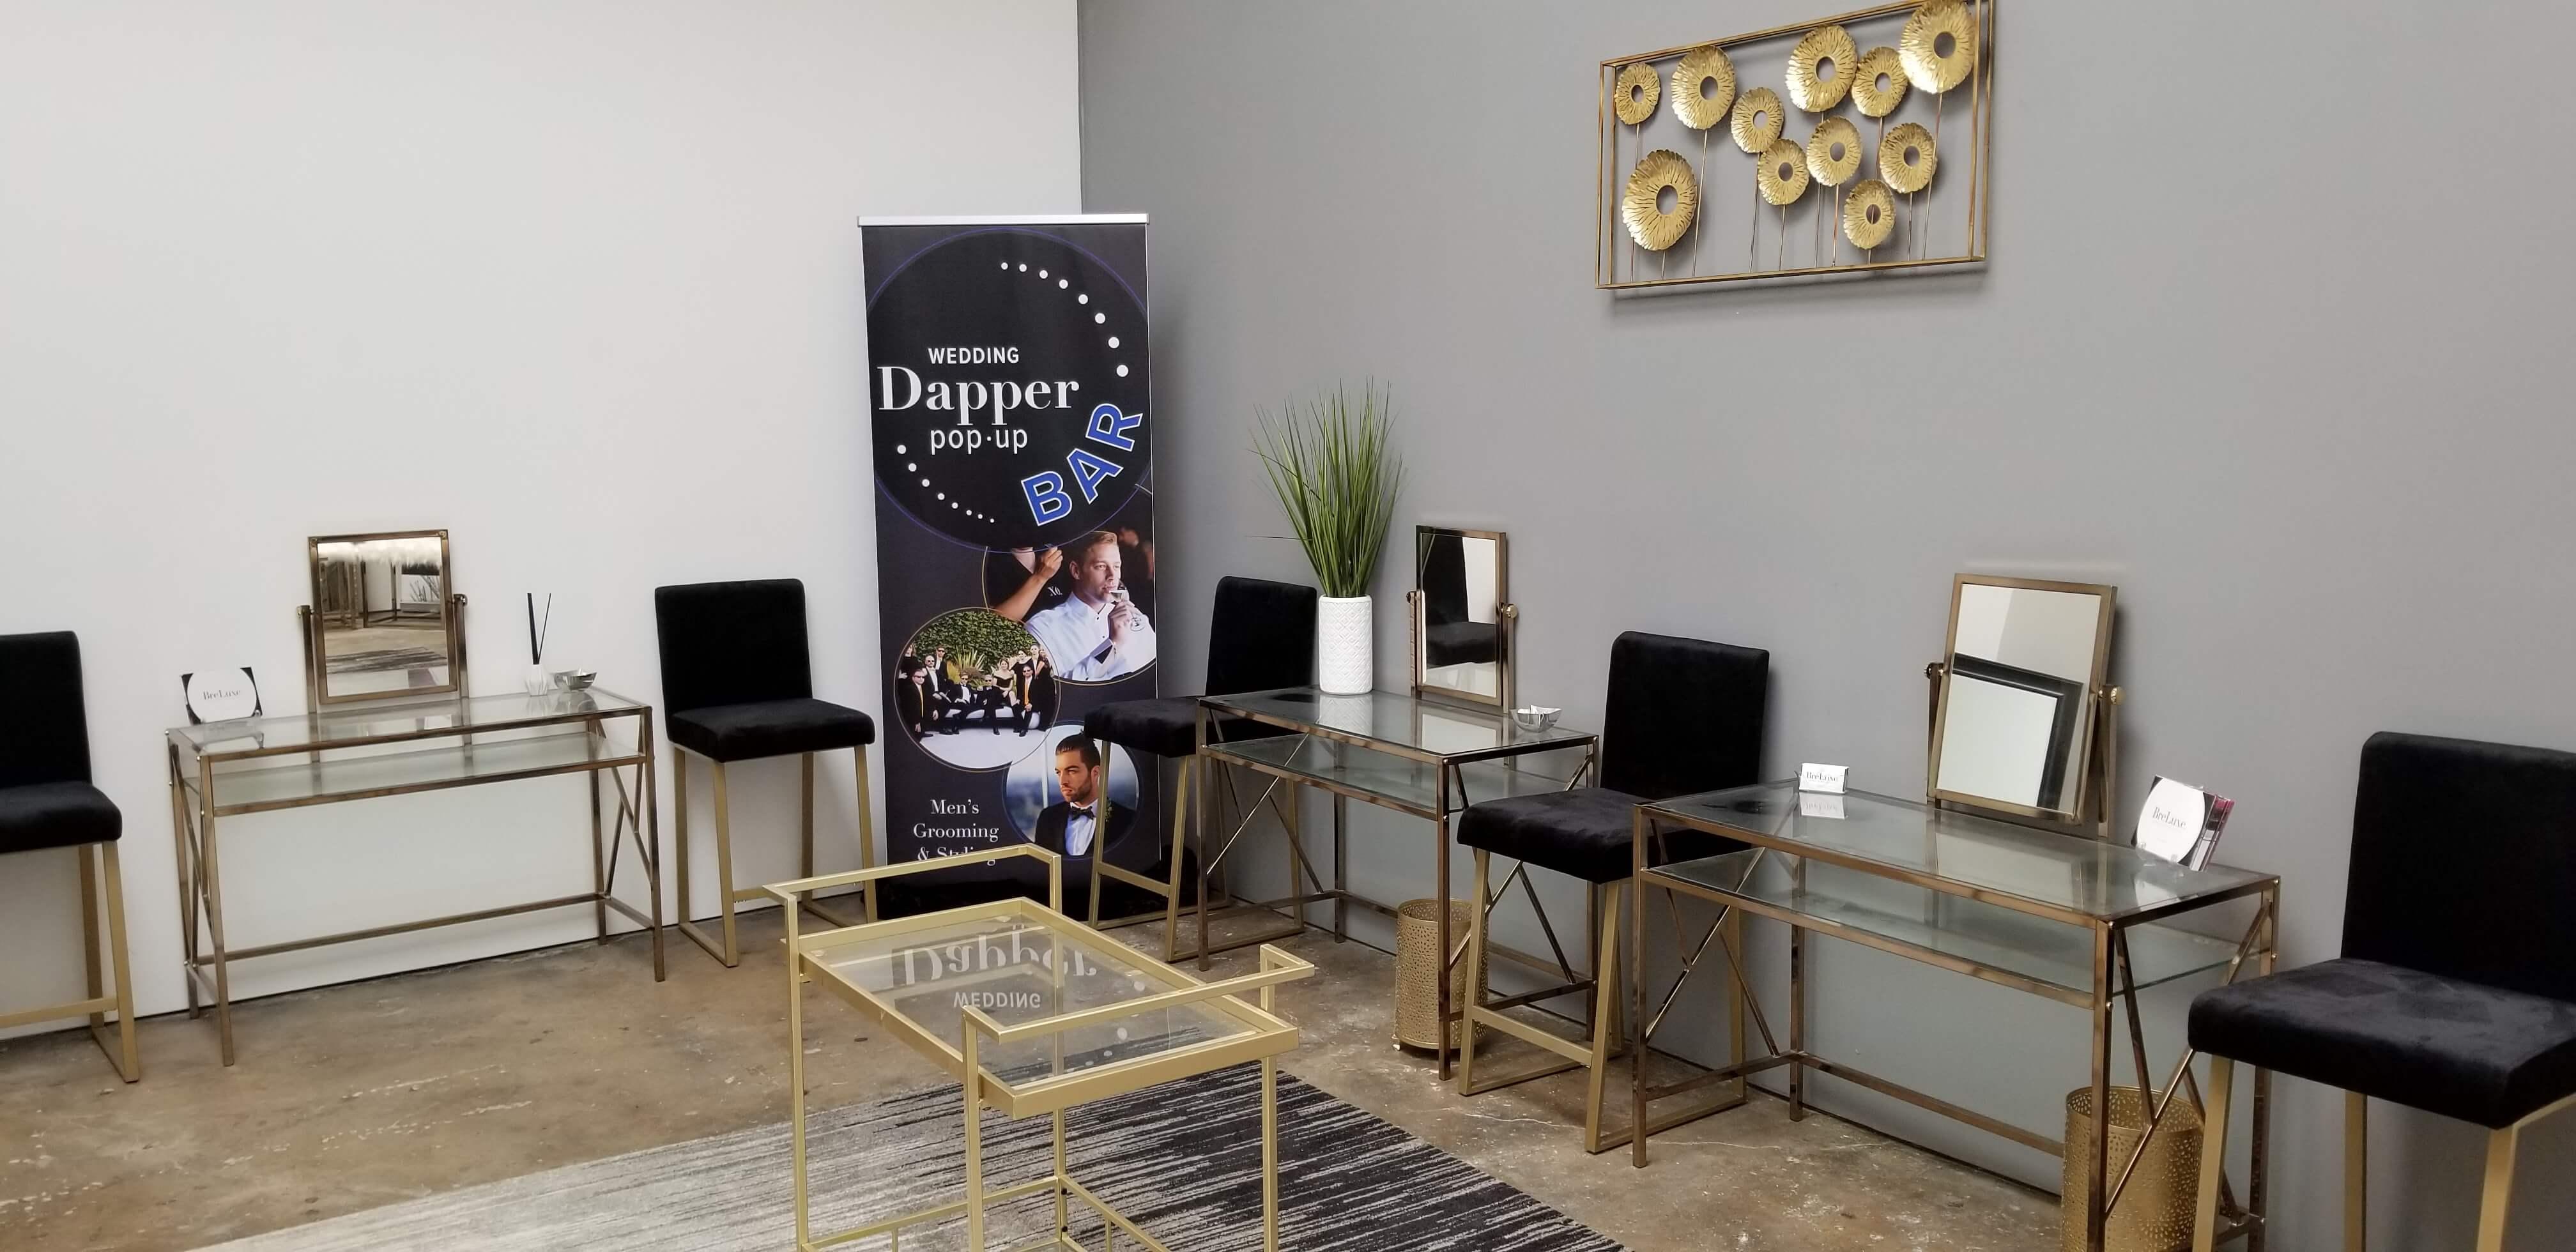 Men's Pop-Up Dapper Bar launches in Los Angeles 4